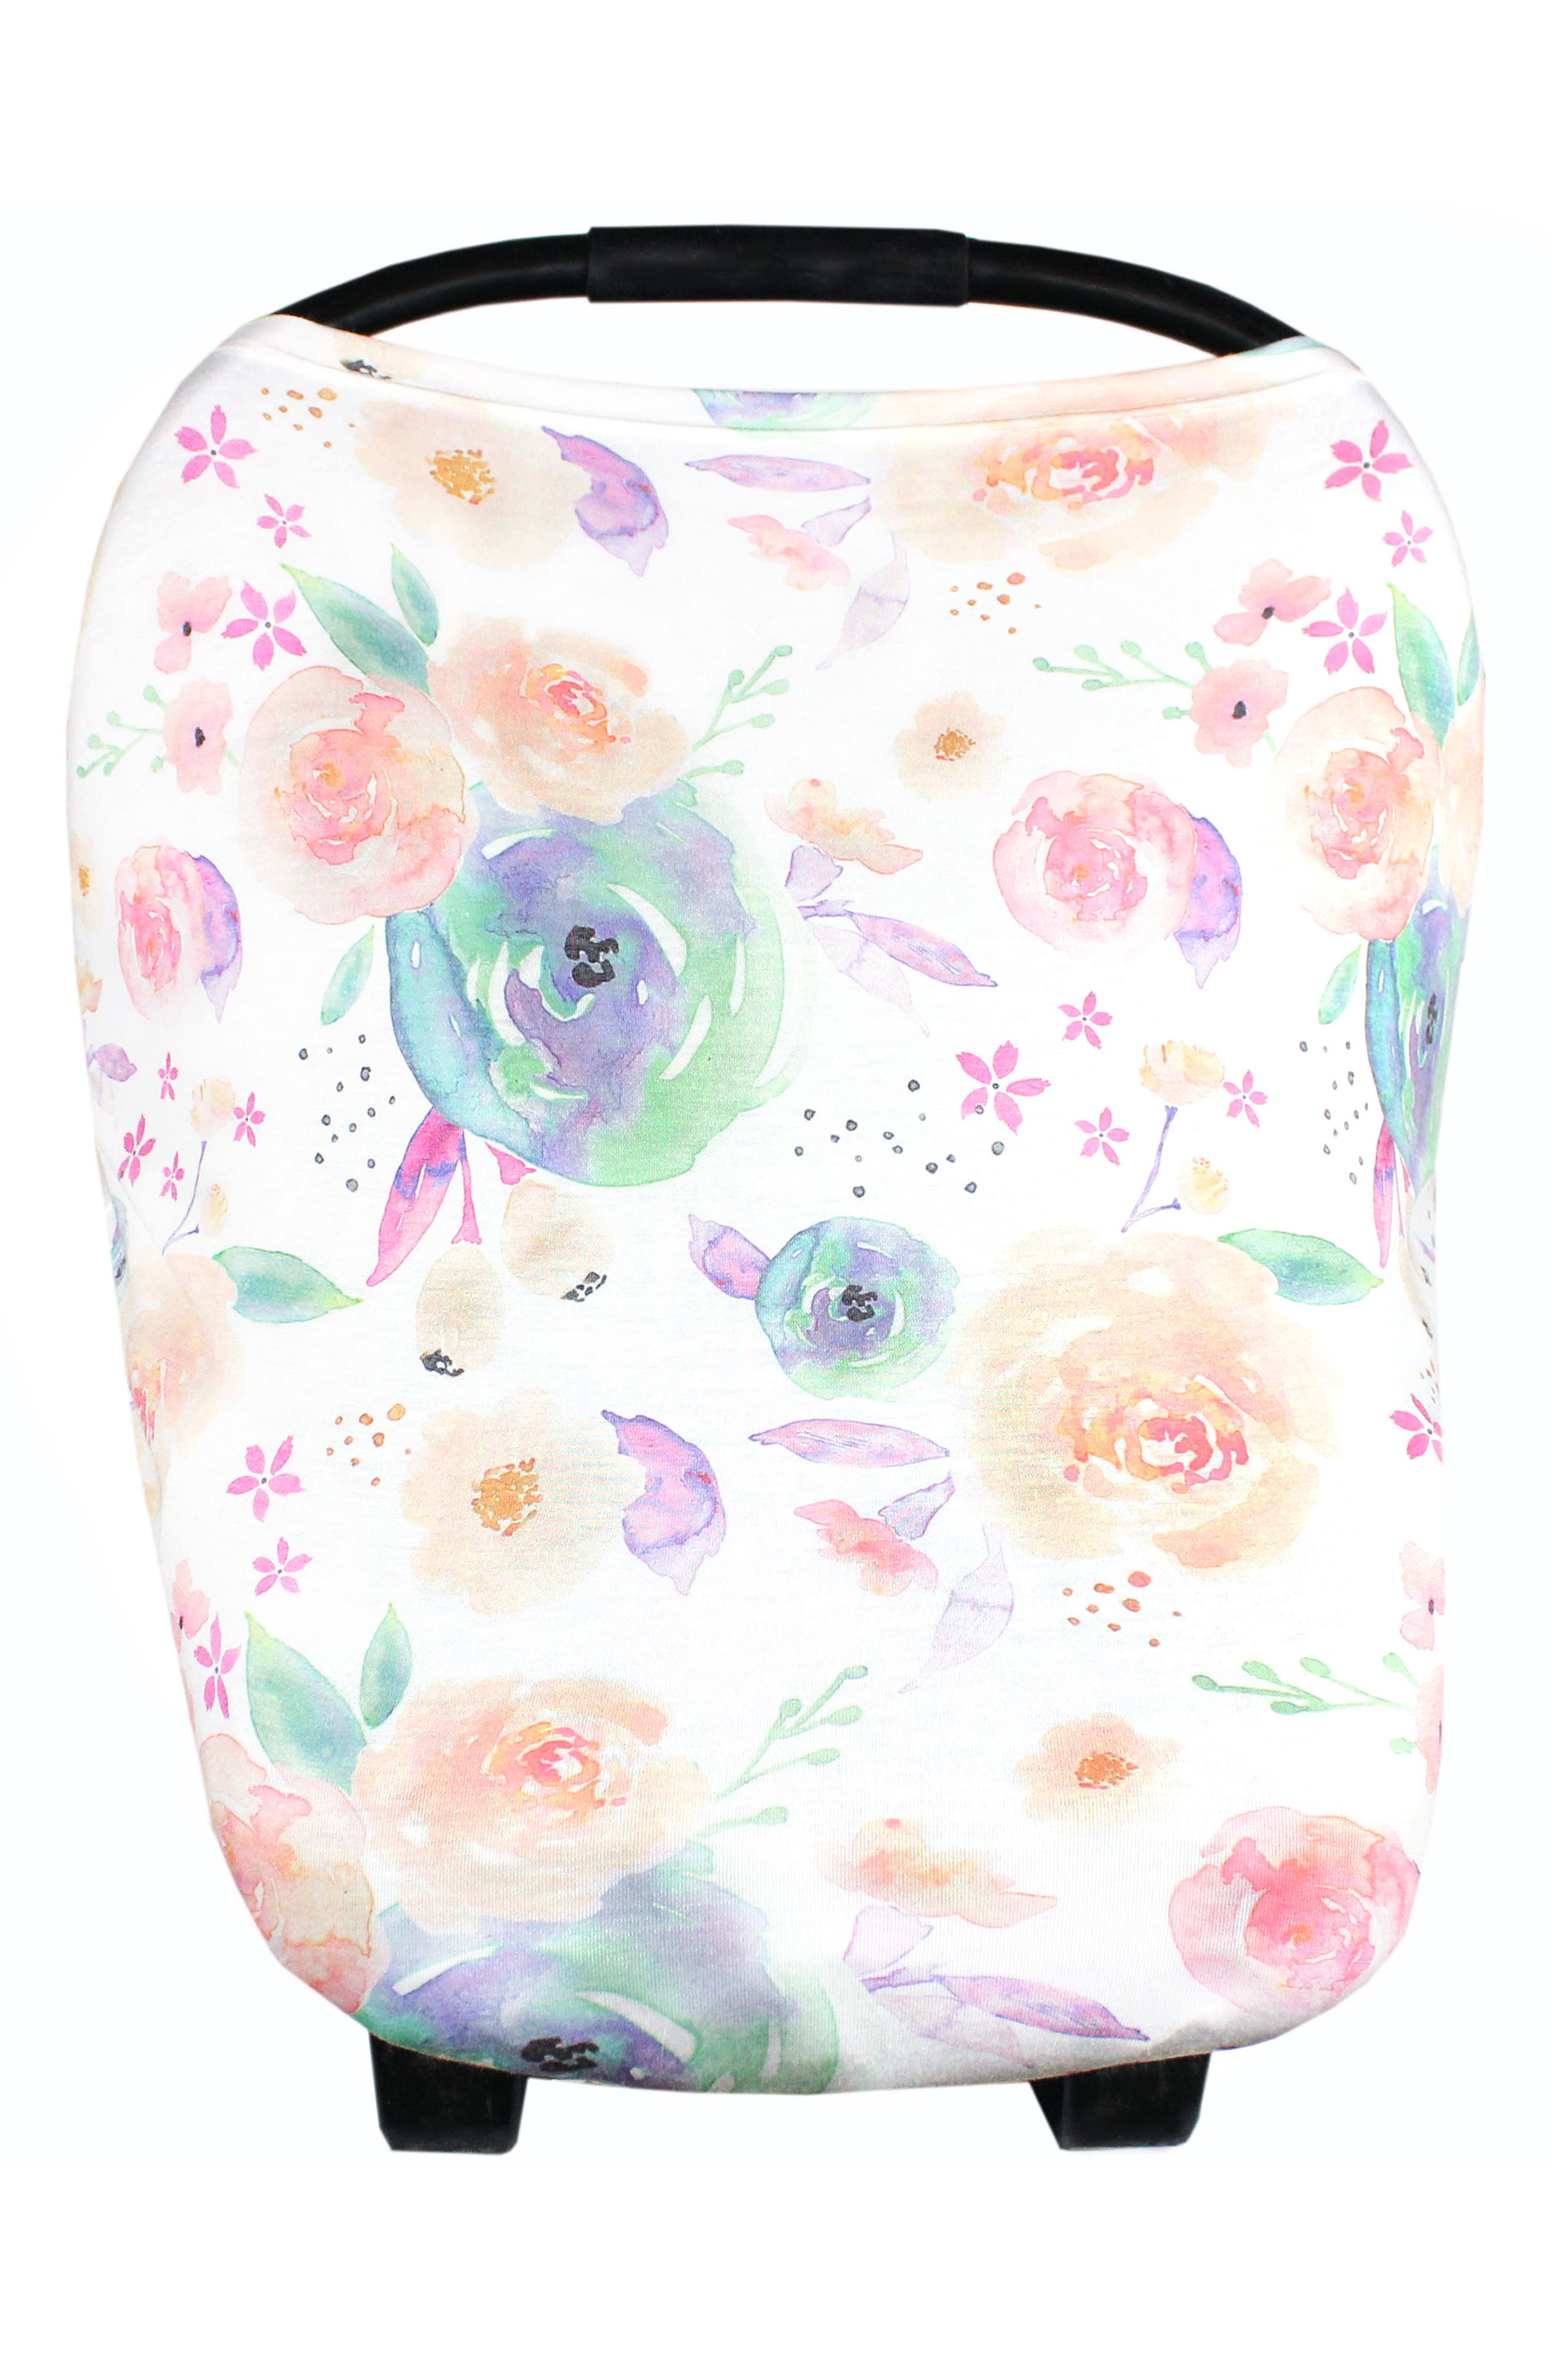 Bloom Multiuse Cover & Swaddle Blanket Gift Set,                             Alternate thumbnail 19, color,                             Bloom